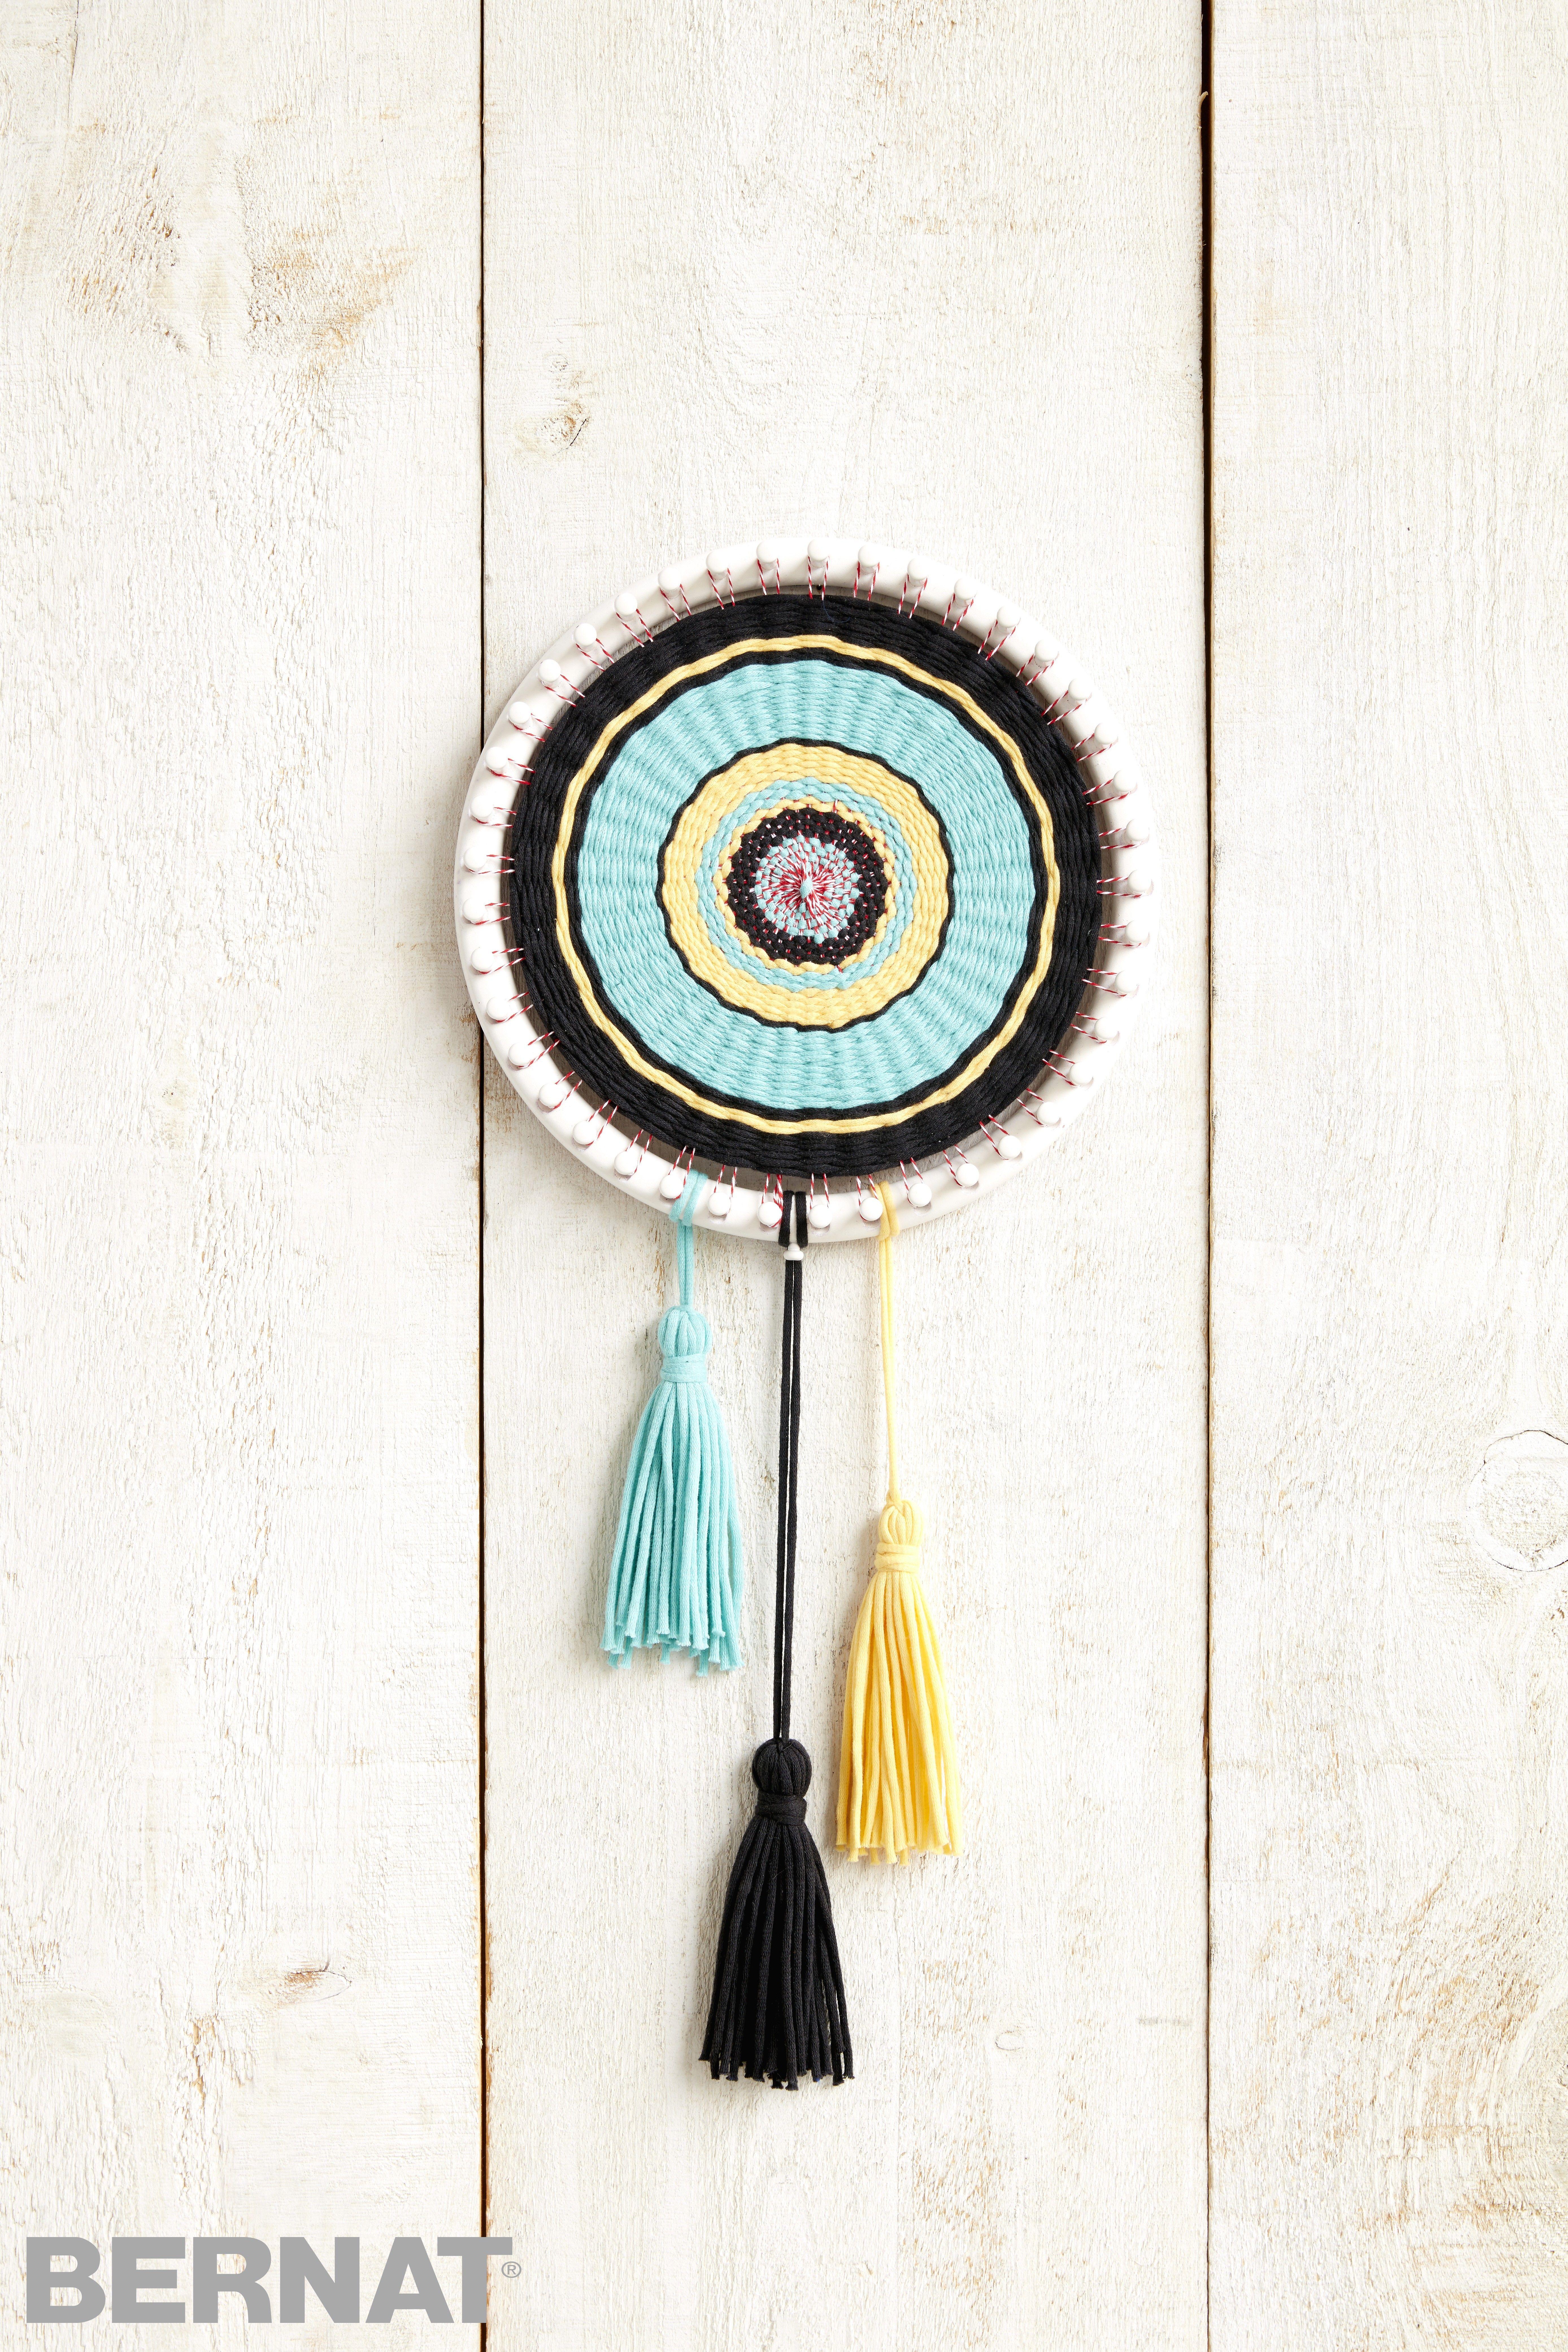 Circle Loom Weaving | No needle? No problem! Use new Bernat Maker ...